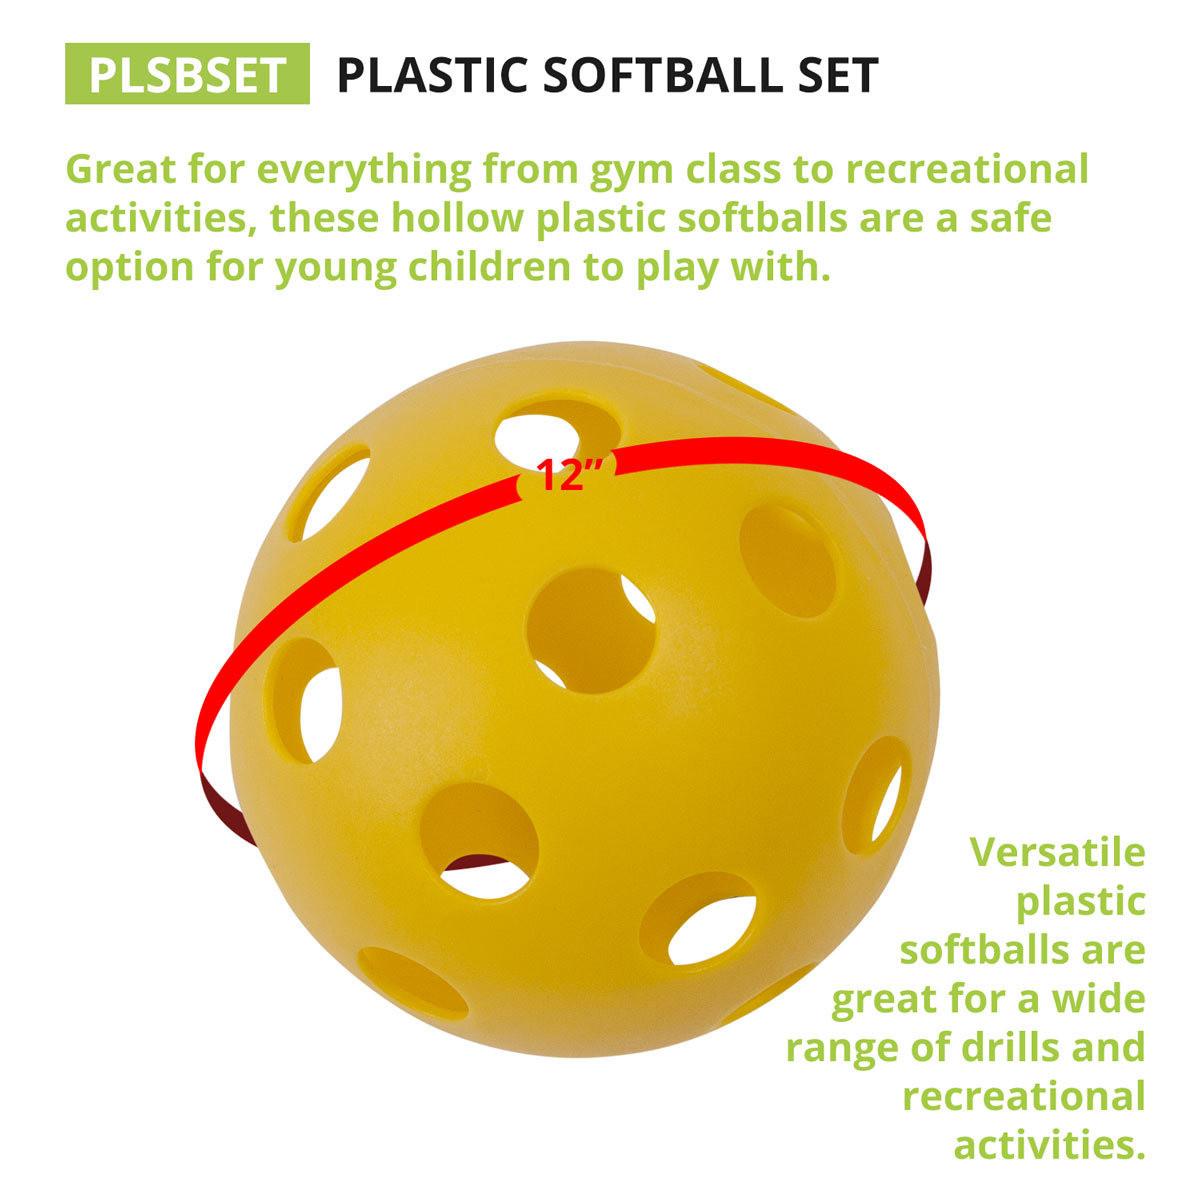 Champion Sports Plastic Softball Set PLSBSET